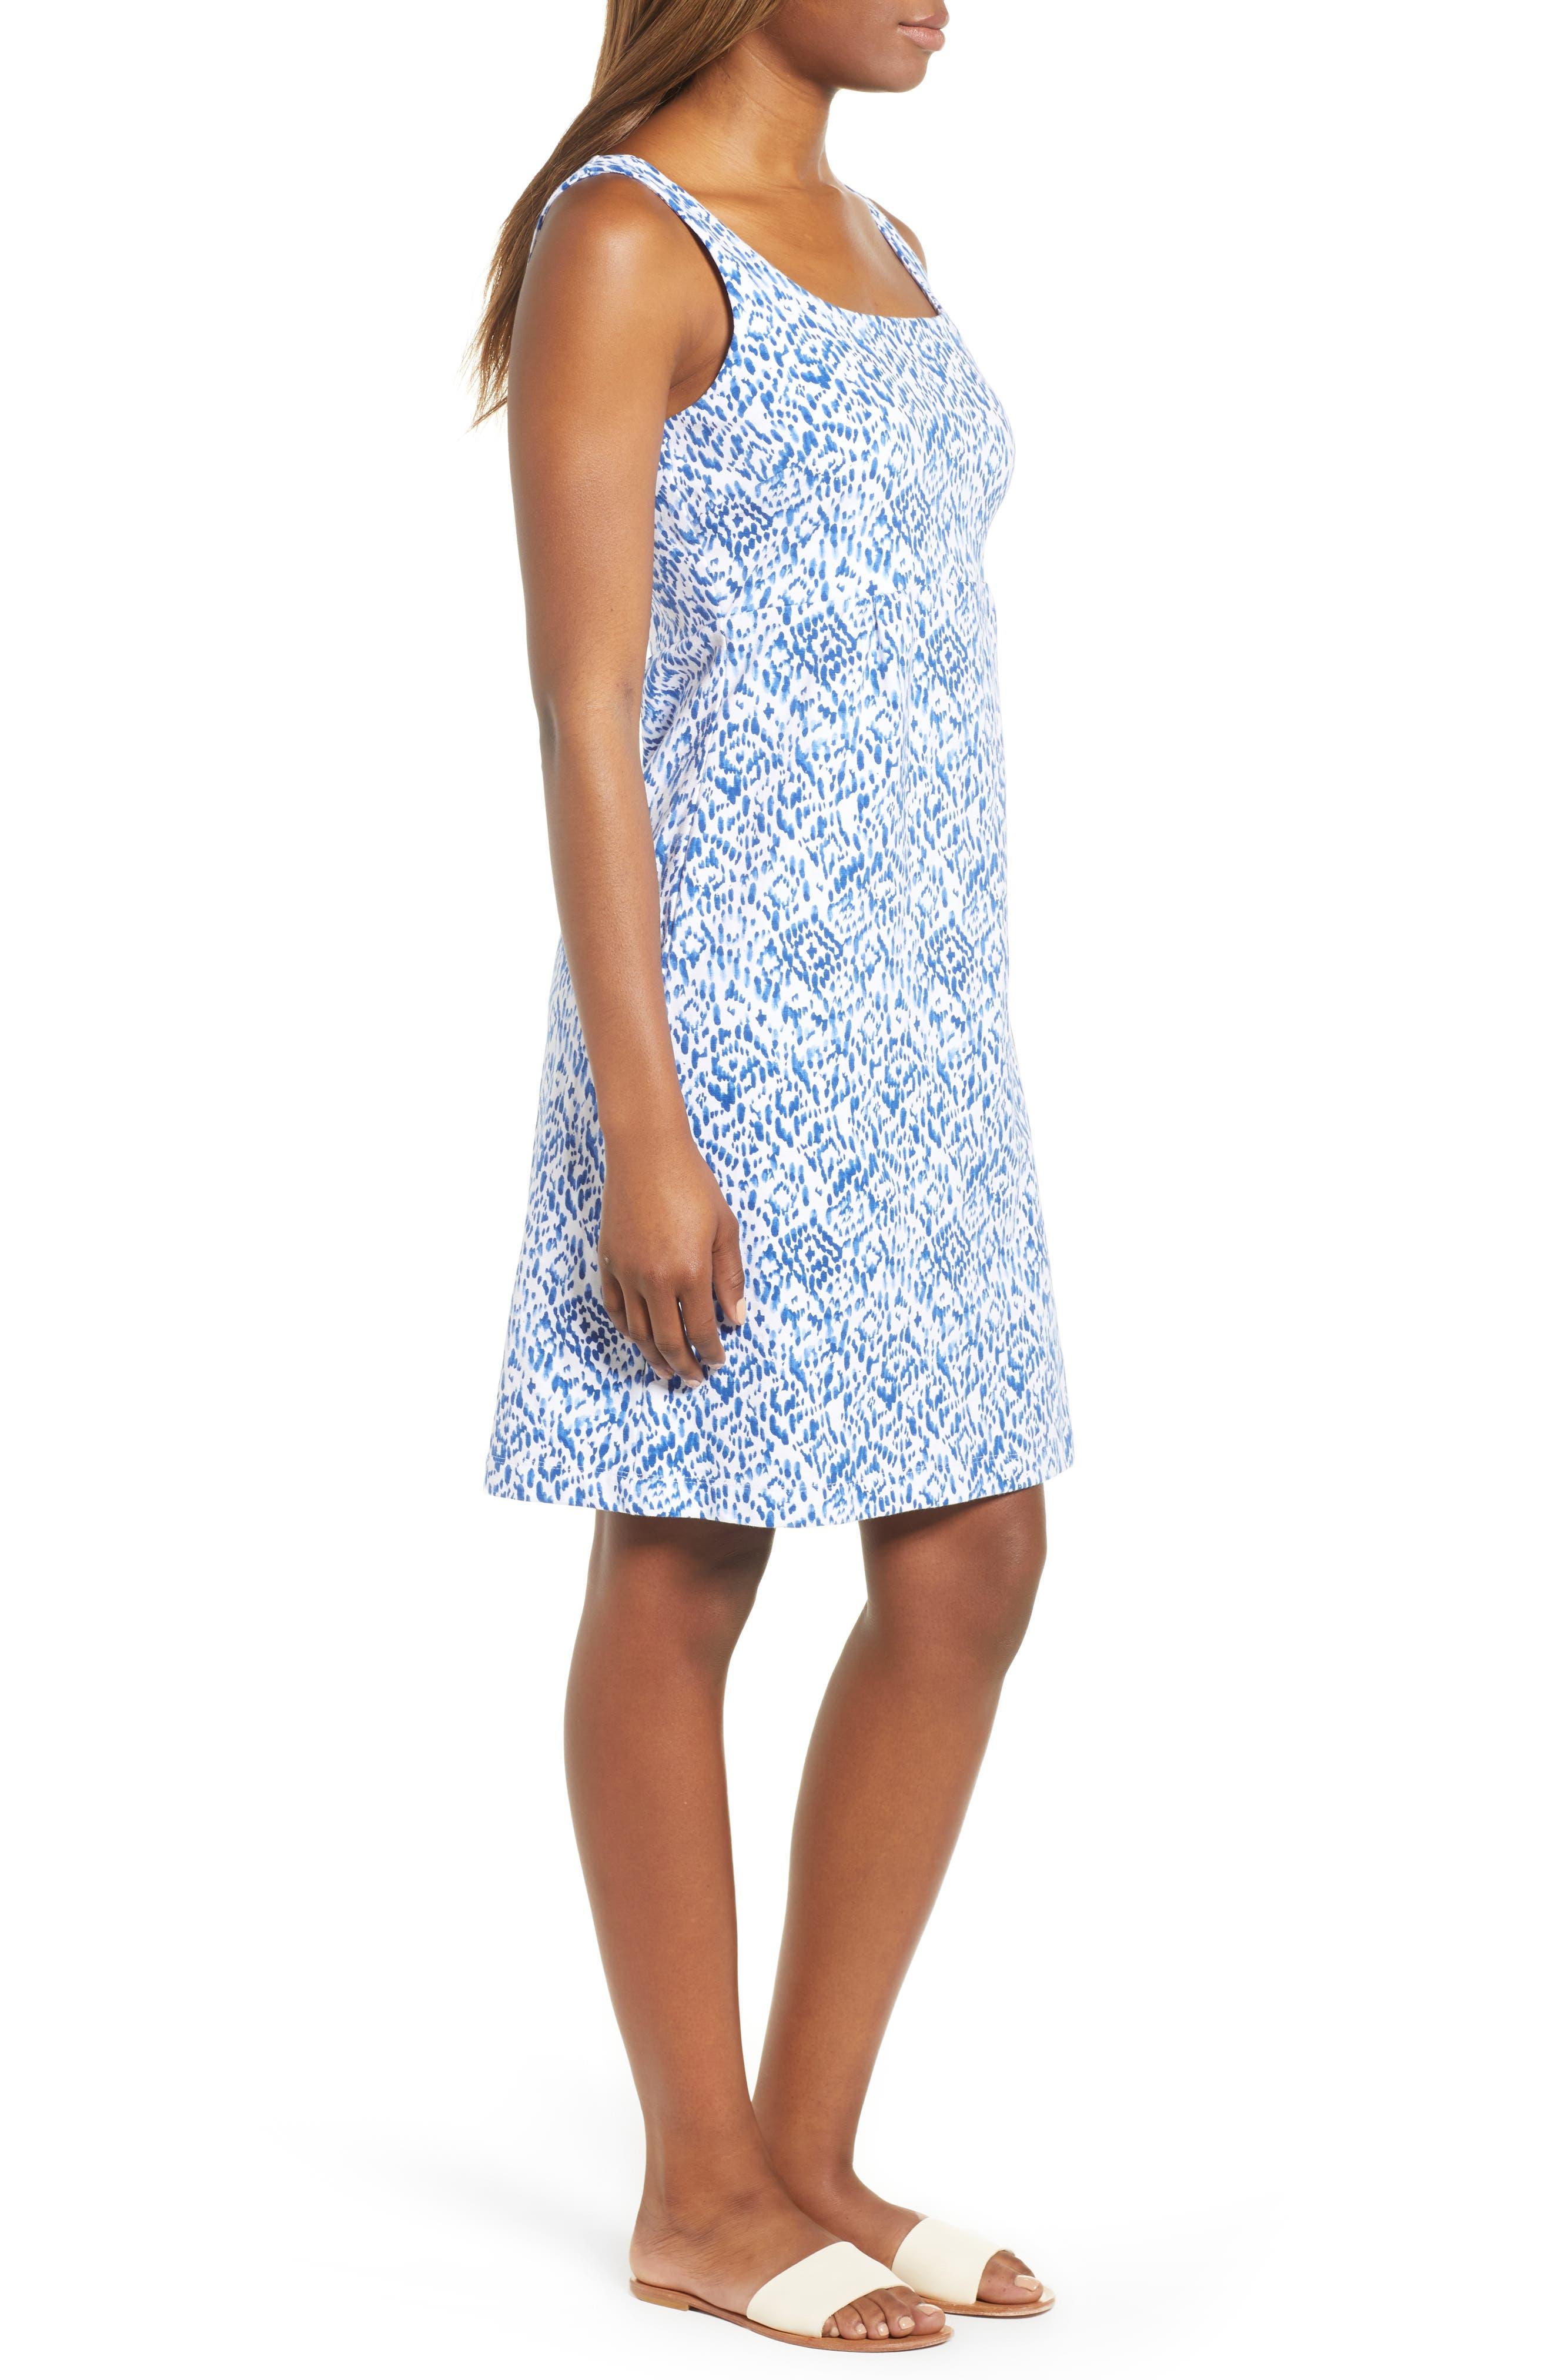 La Liorena Sleeveless Stretch Cotton Tank Dress,                             Alternate thumbnail 3, color,                             Palace Blue